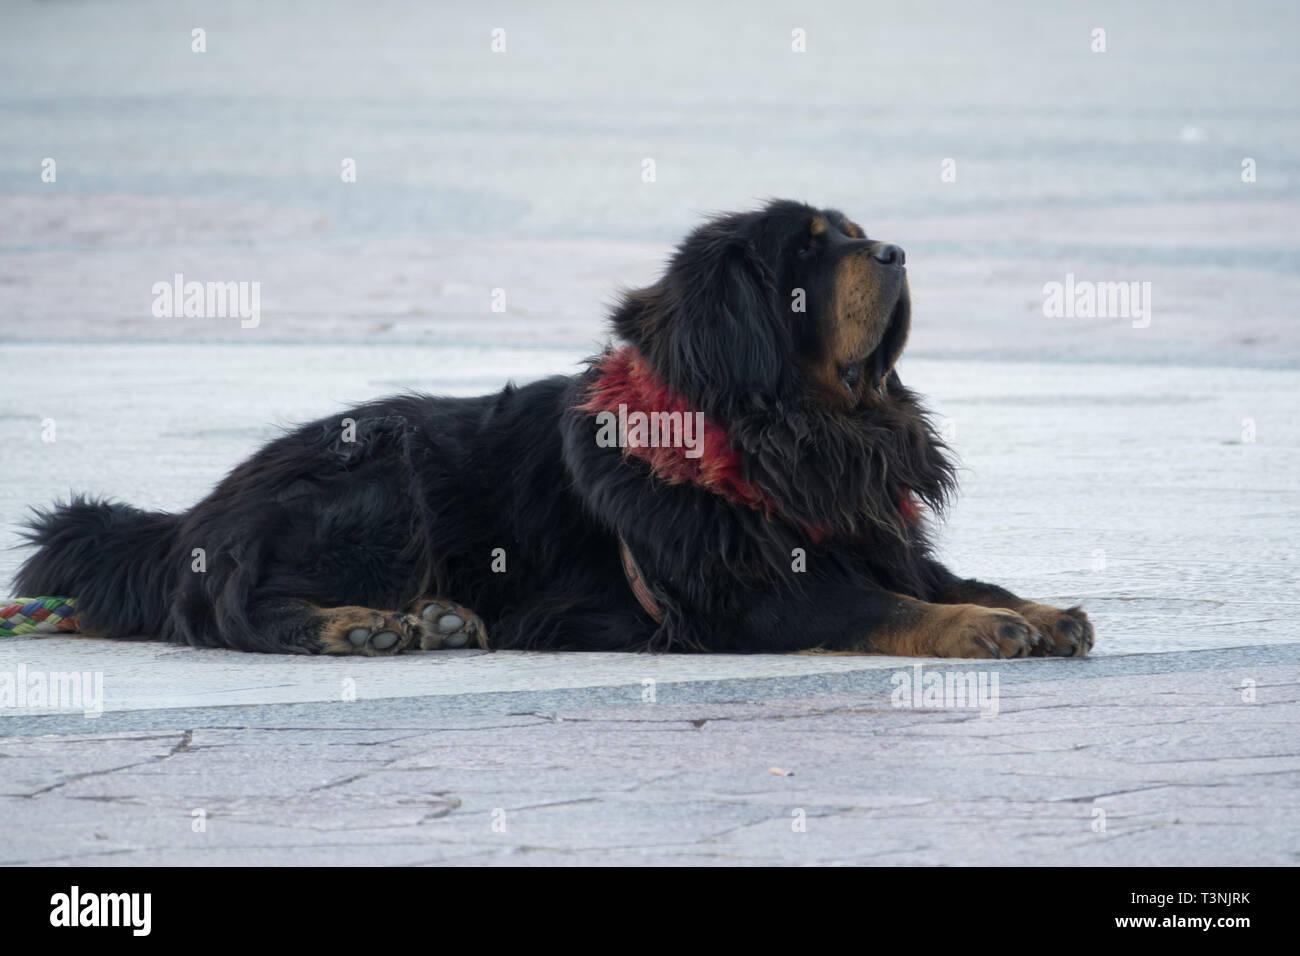 Black Tibetan dog on ground pet of Tibet people - Stock Image